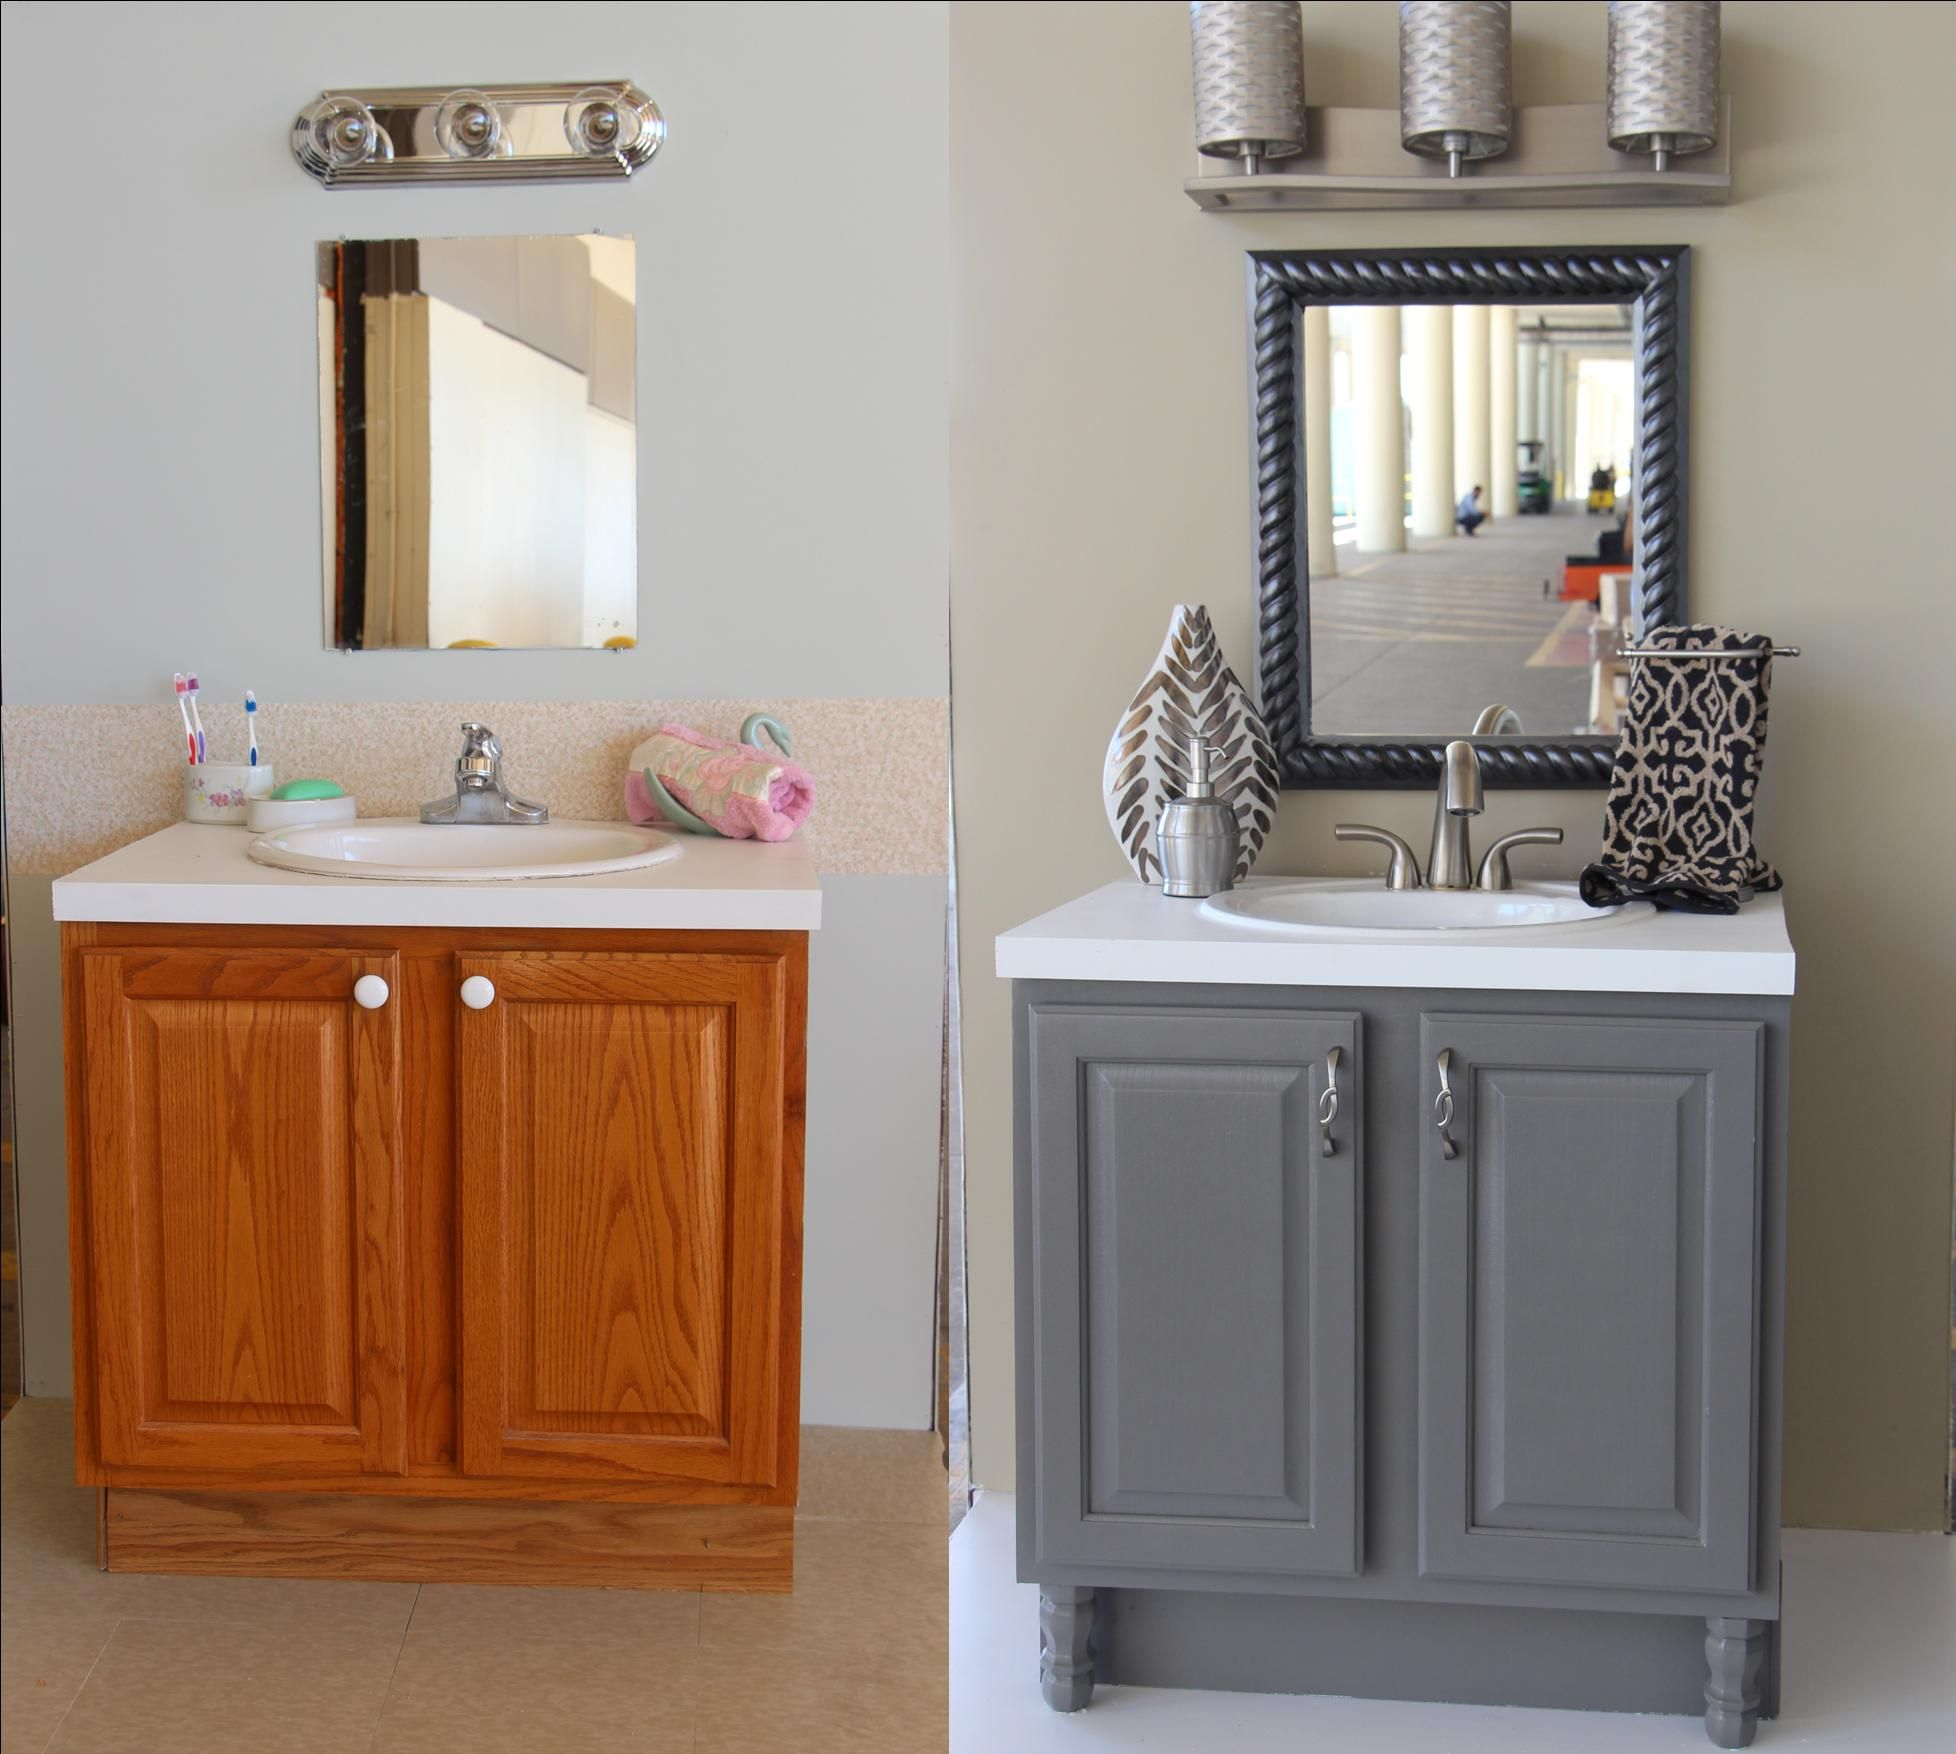 Bathroom Updates You Can Do This Weekend Bathroom Makeover Small Bathroom Remodel Diy Bathroom